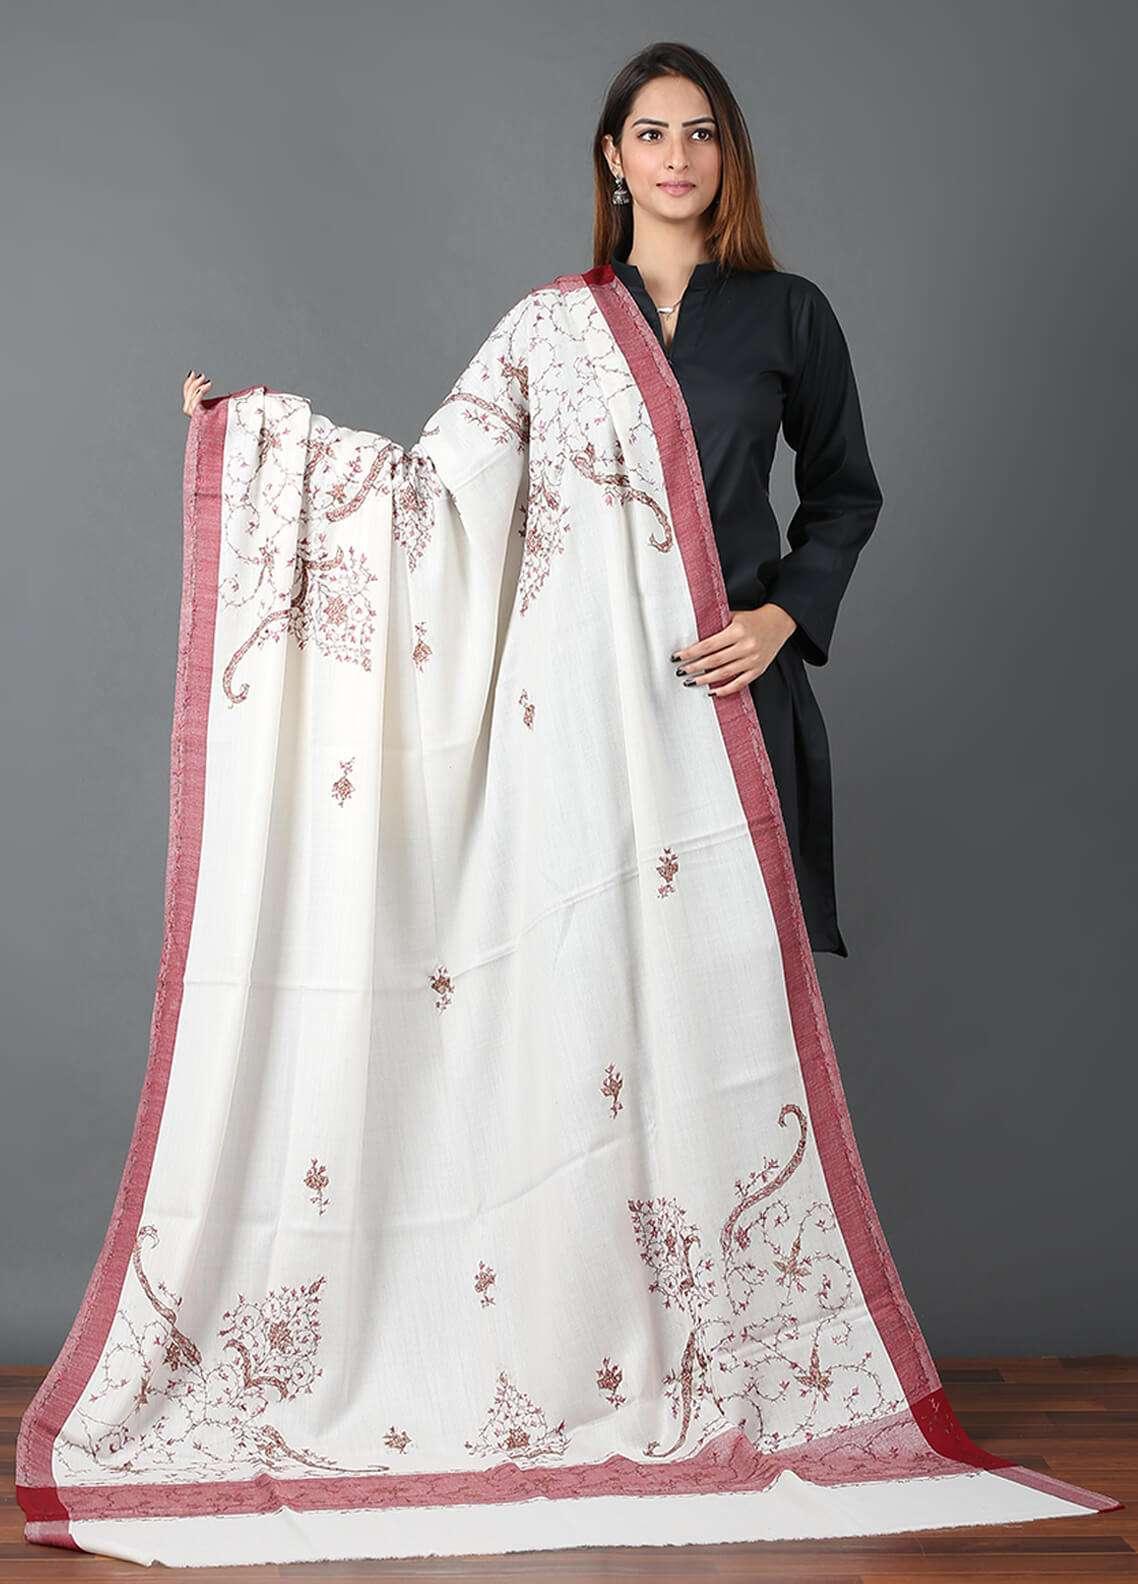 Sanaulla Exclusive Range  Pashmina Embroidered Shawl 663 - Kashmiri Shawls